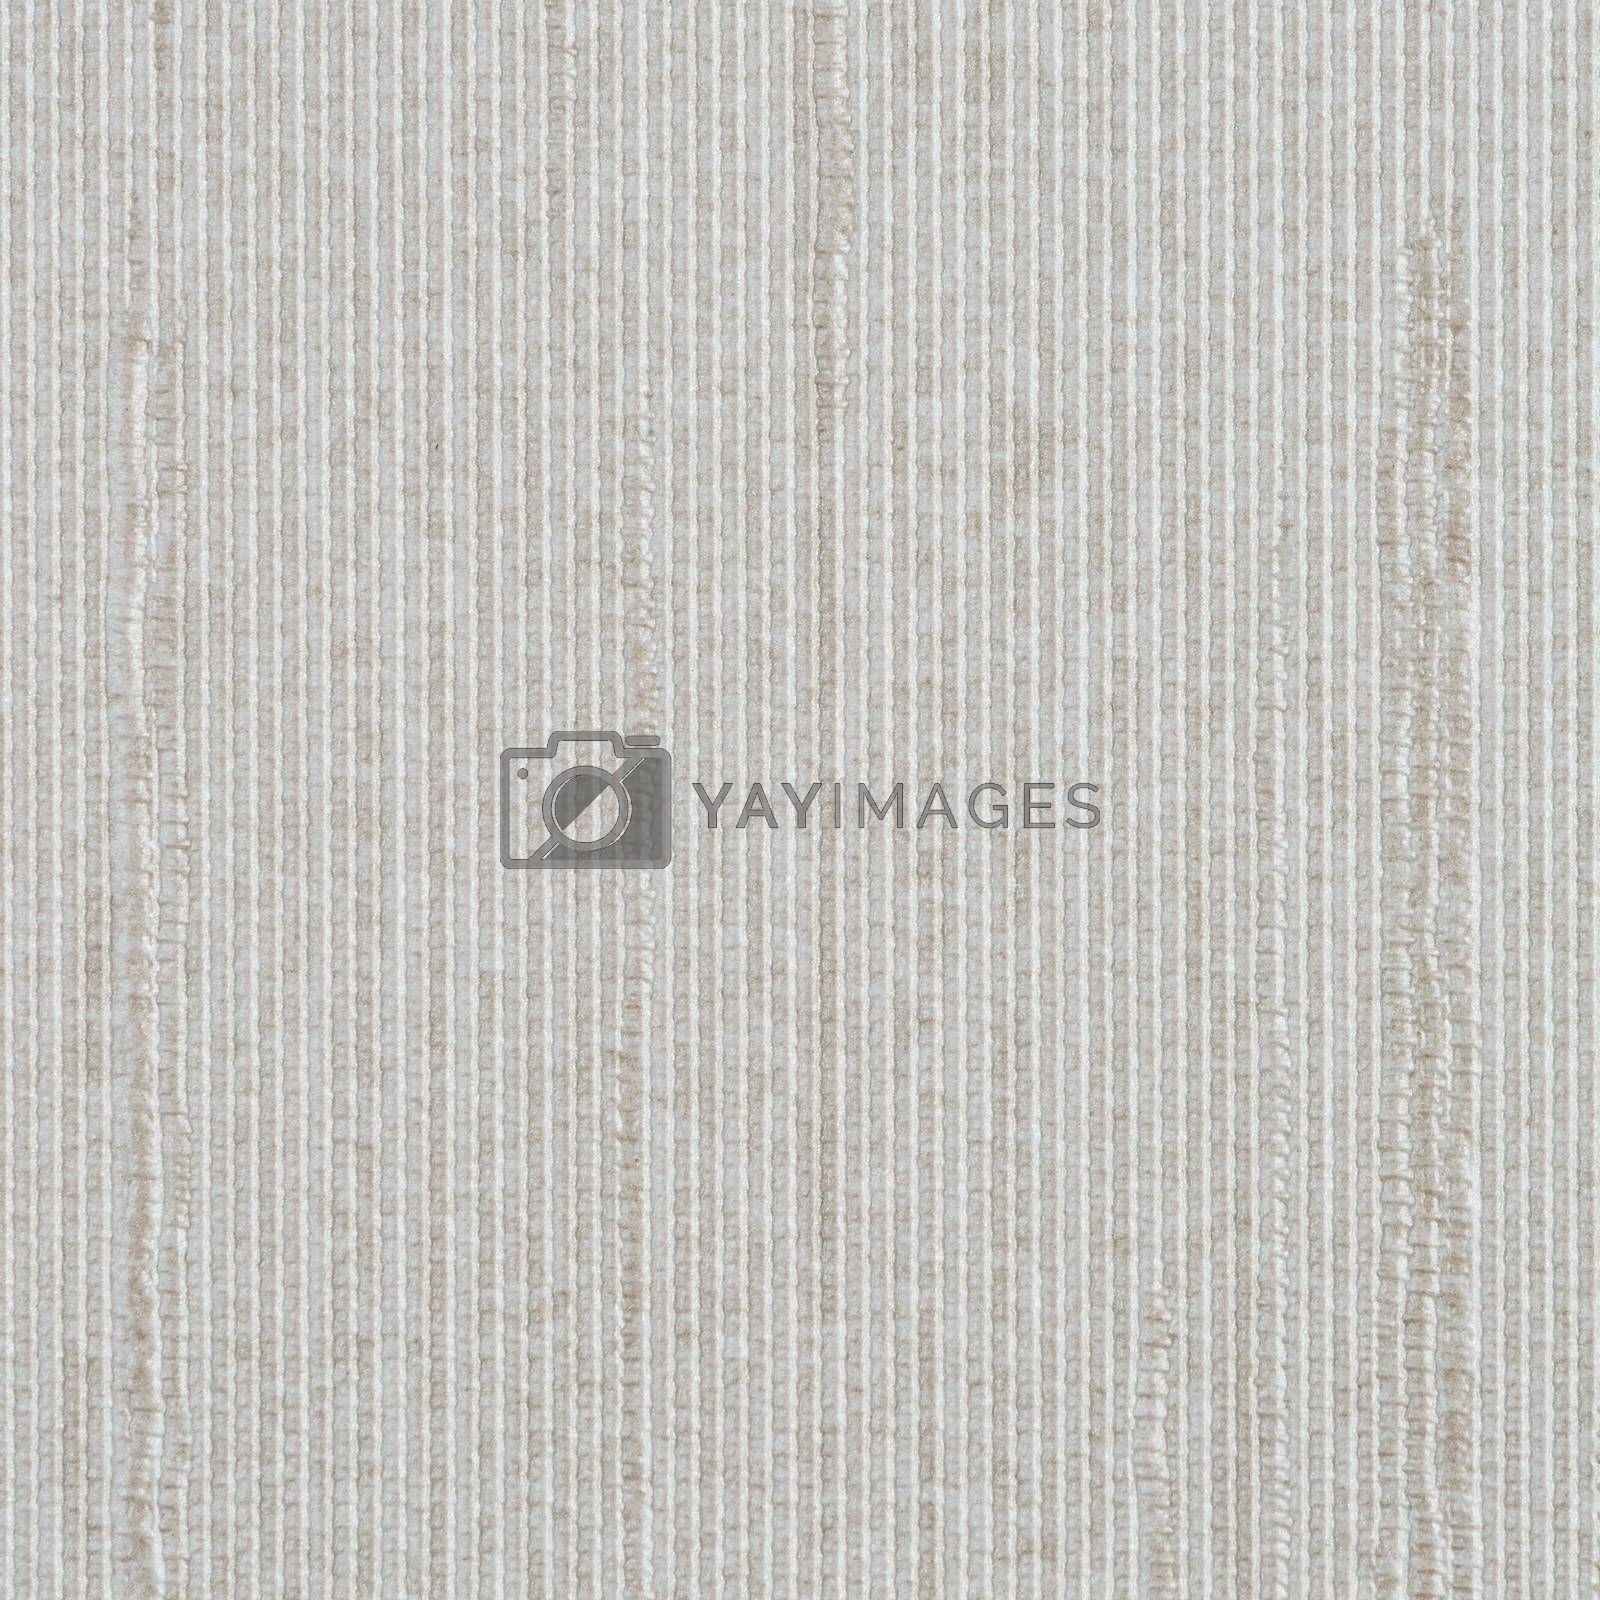 Royalty free image of Brown vinyl texture by homydesign